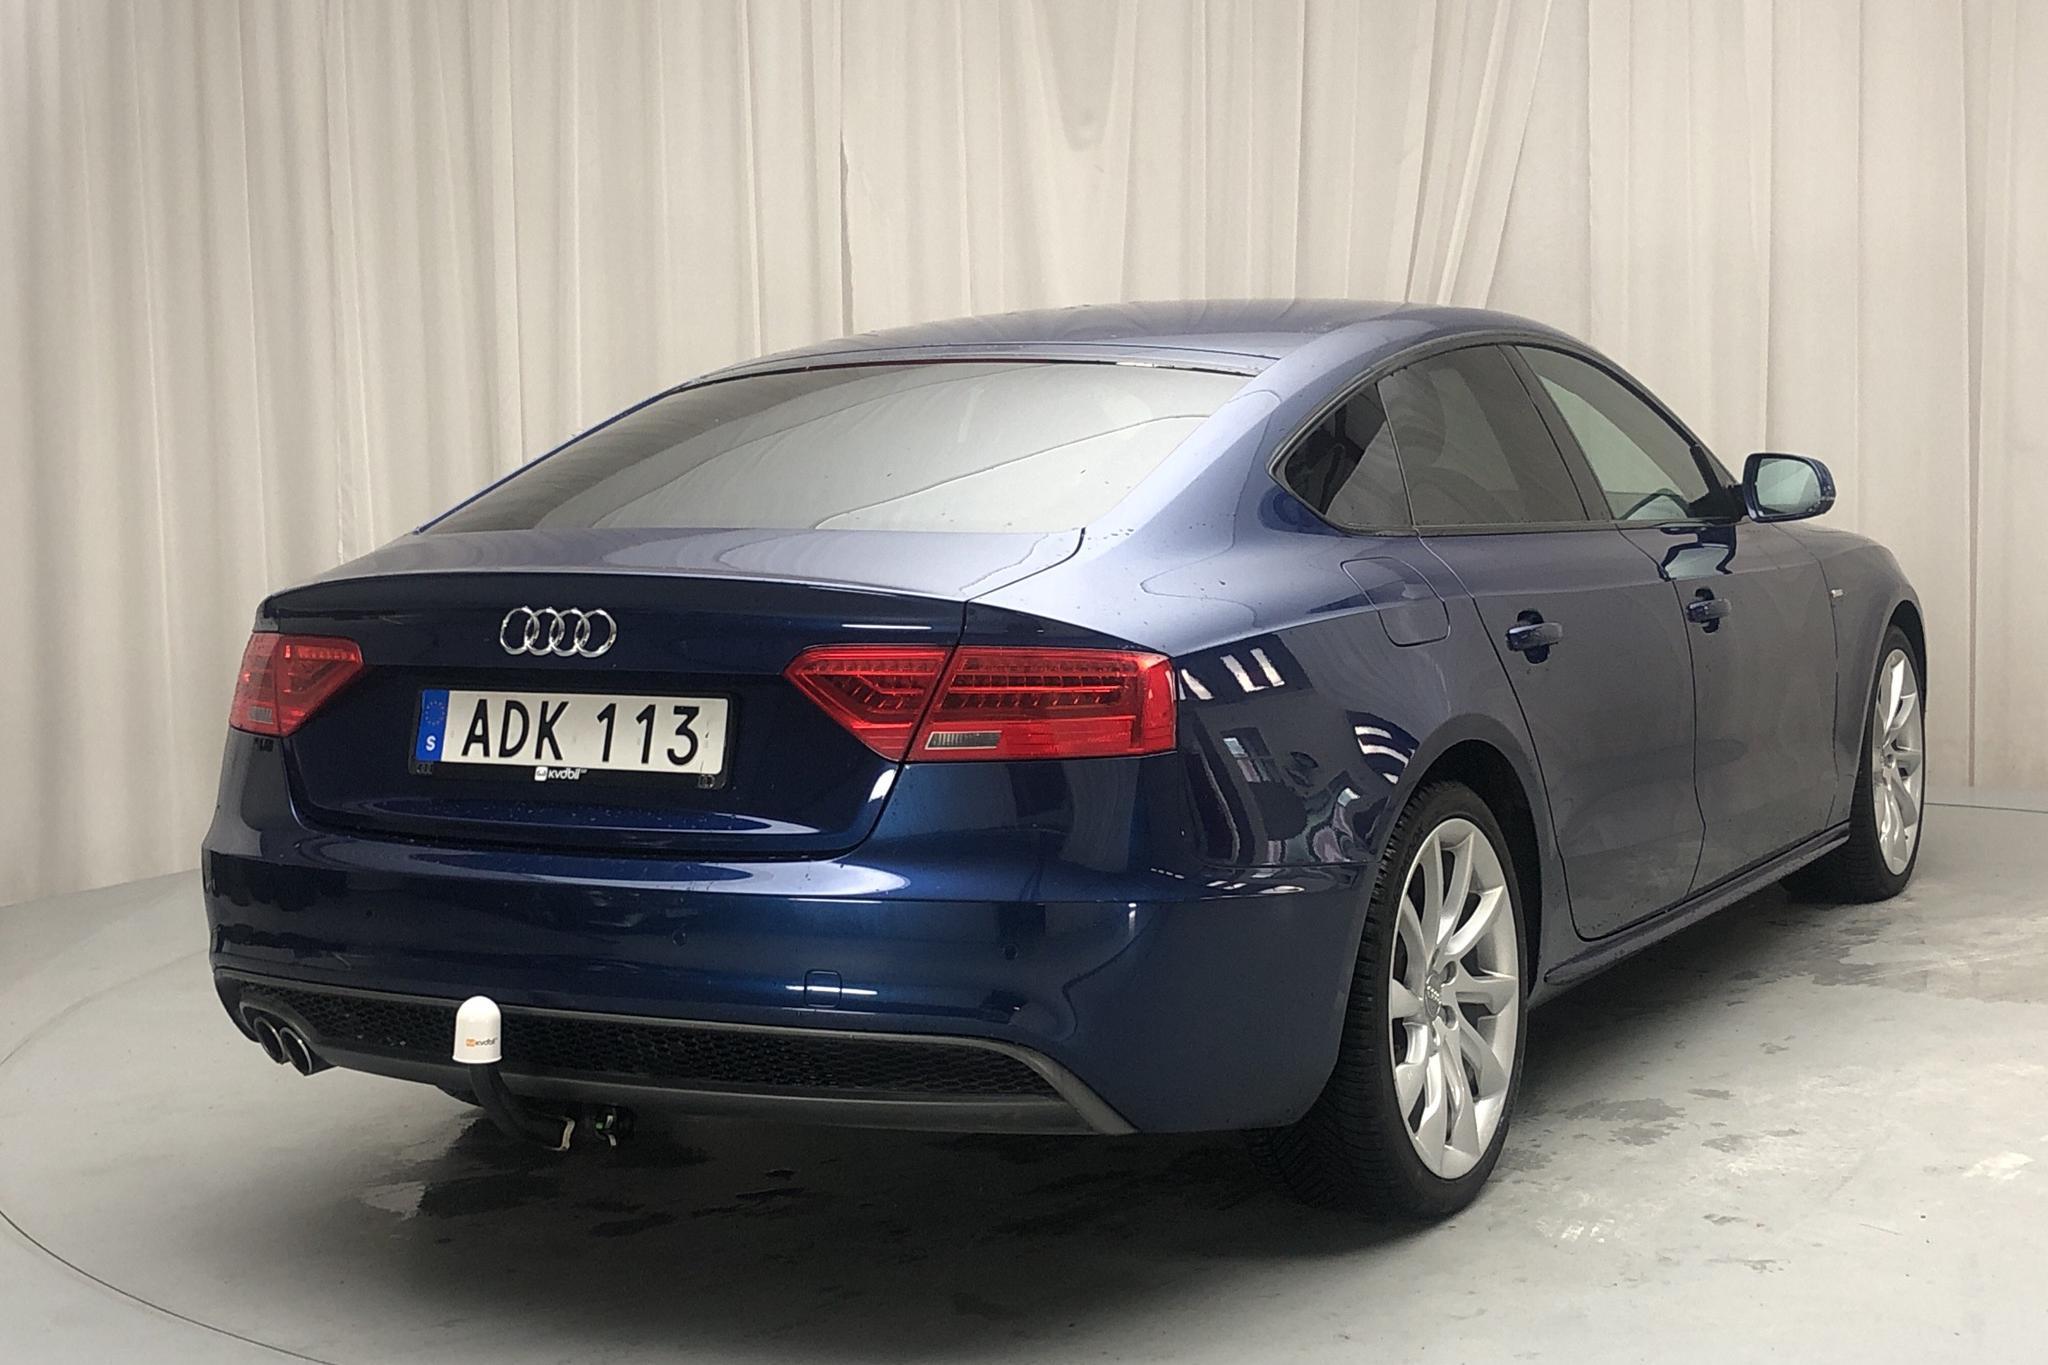 Audi A5 2.0 TDI Sportback quattro (177hk) - 11 701 mil - Automat - blå - 2014